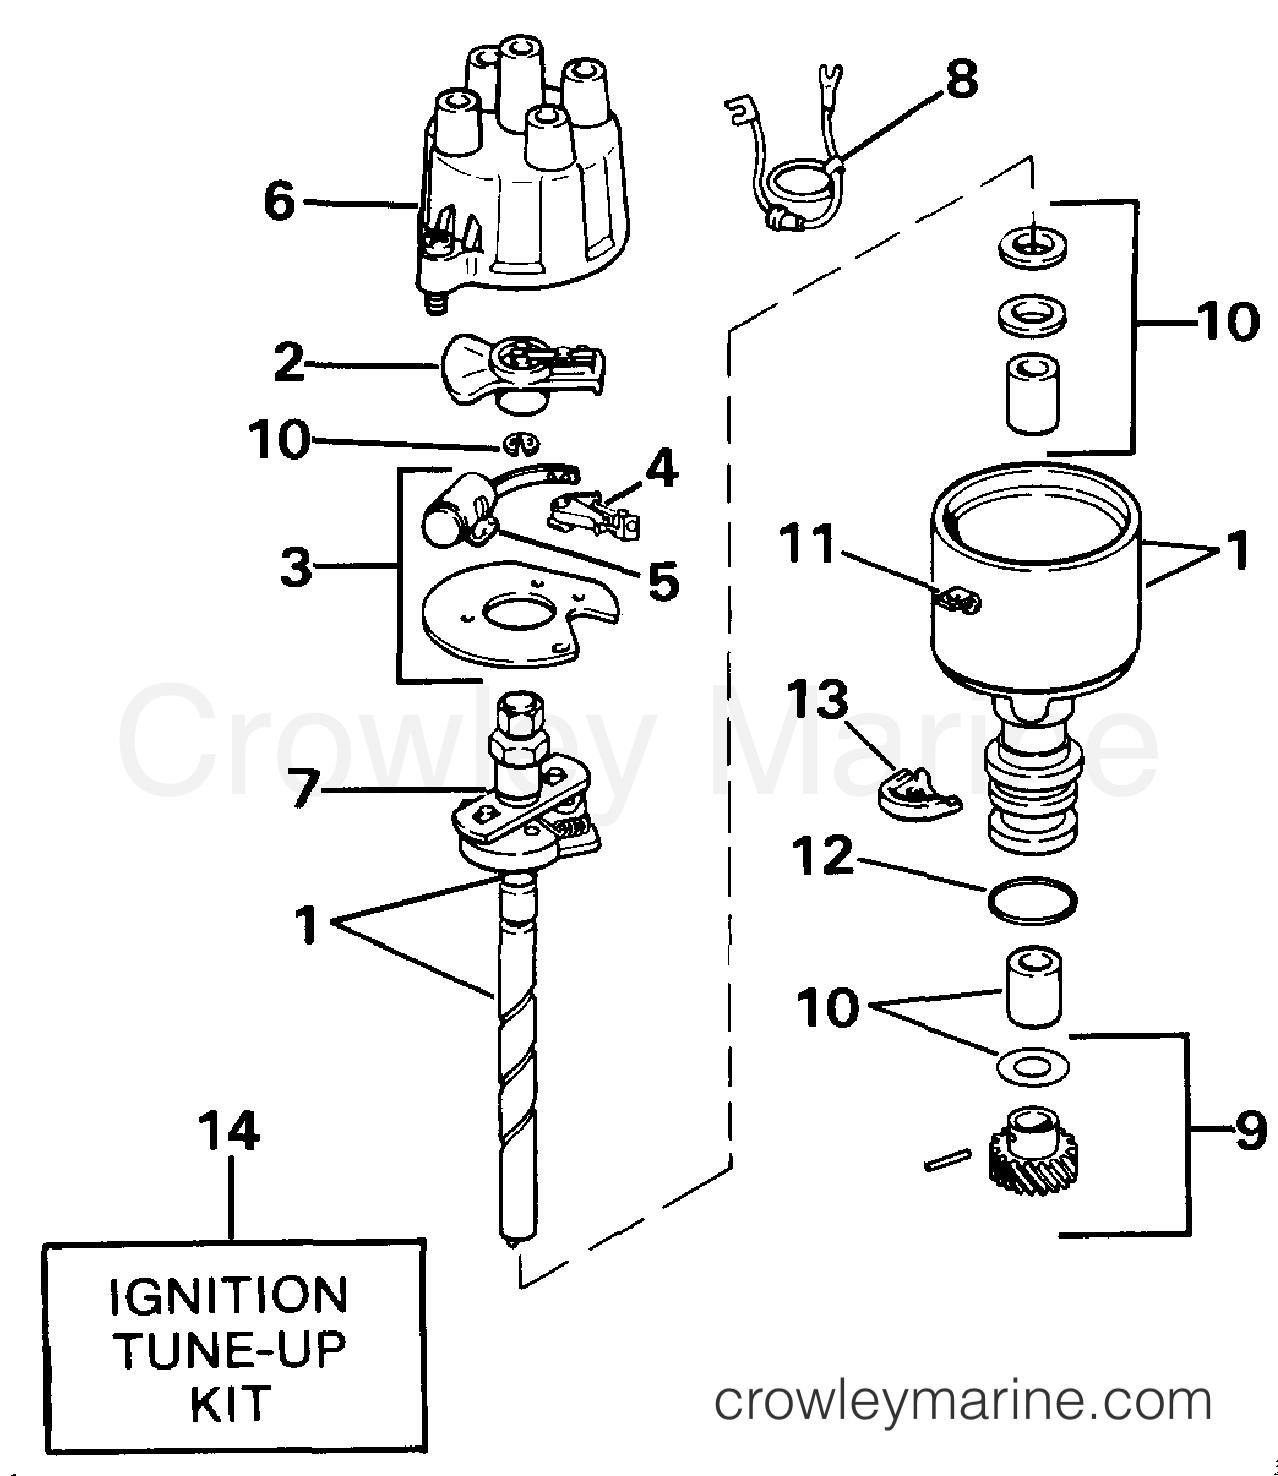 Distributor - Prestolite